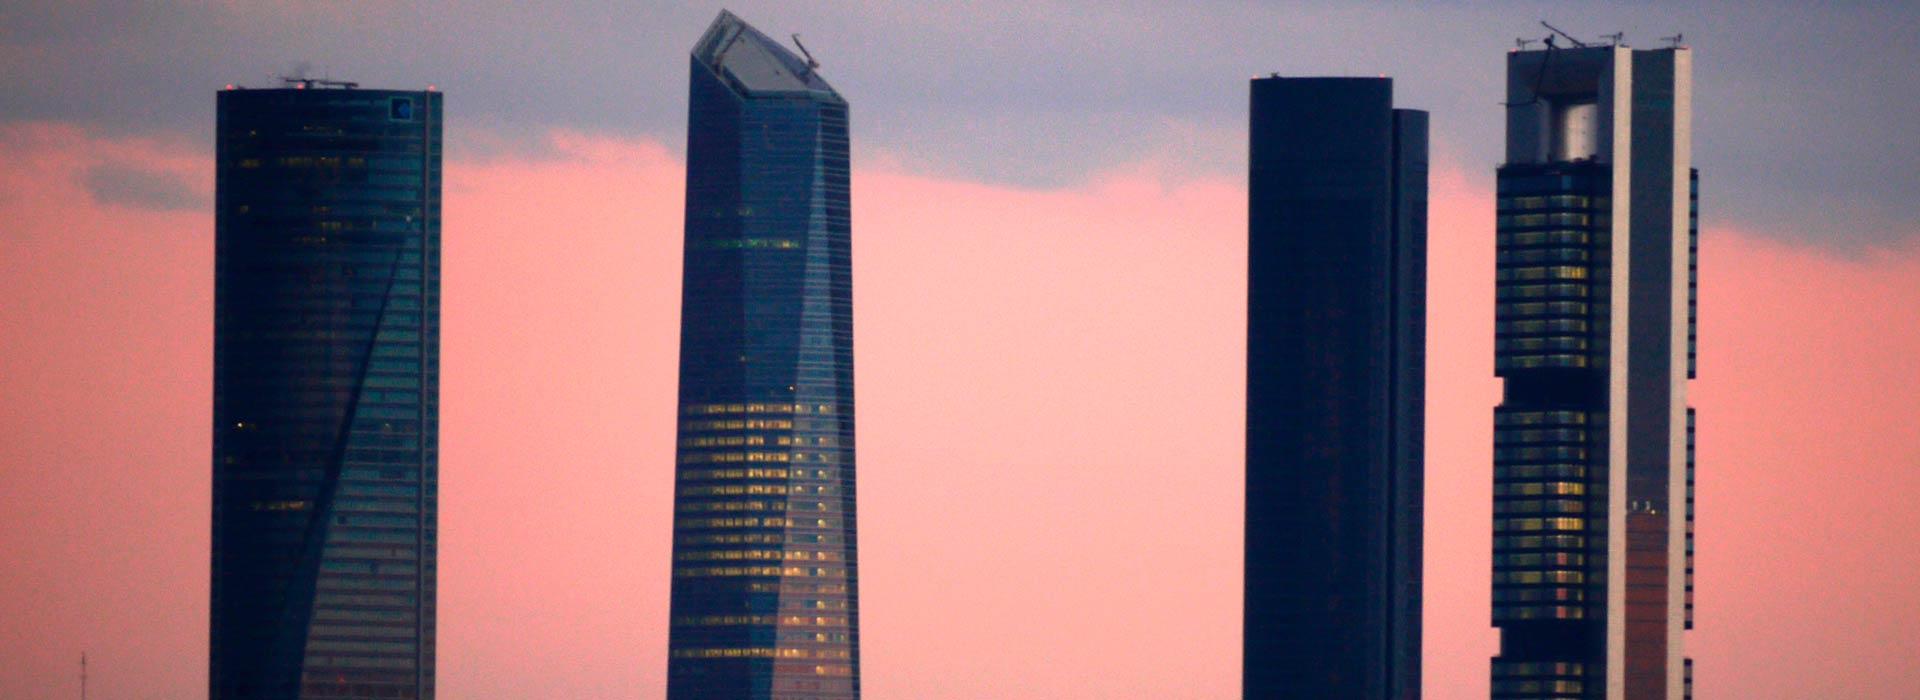 Madrid. Las cuatro torres